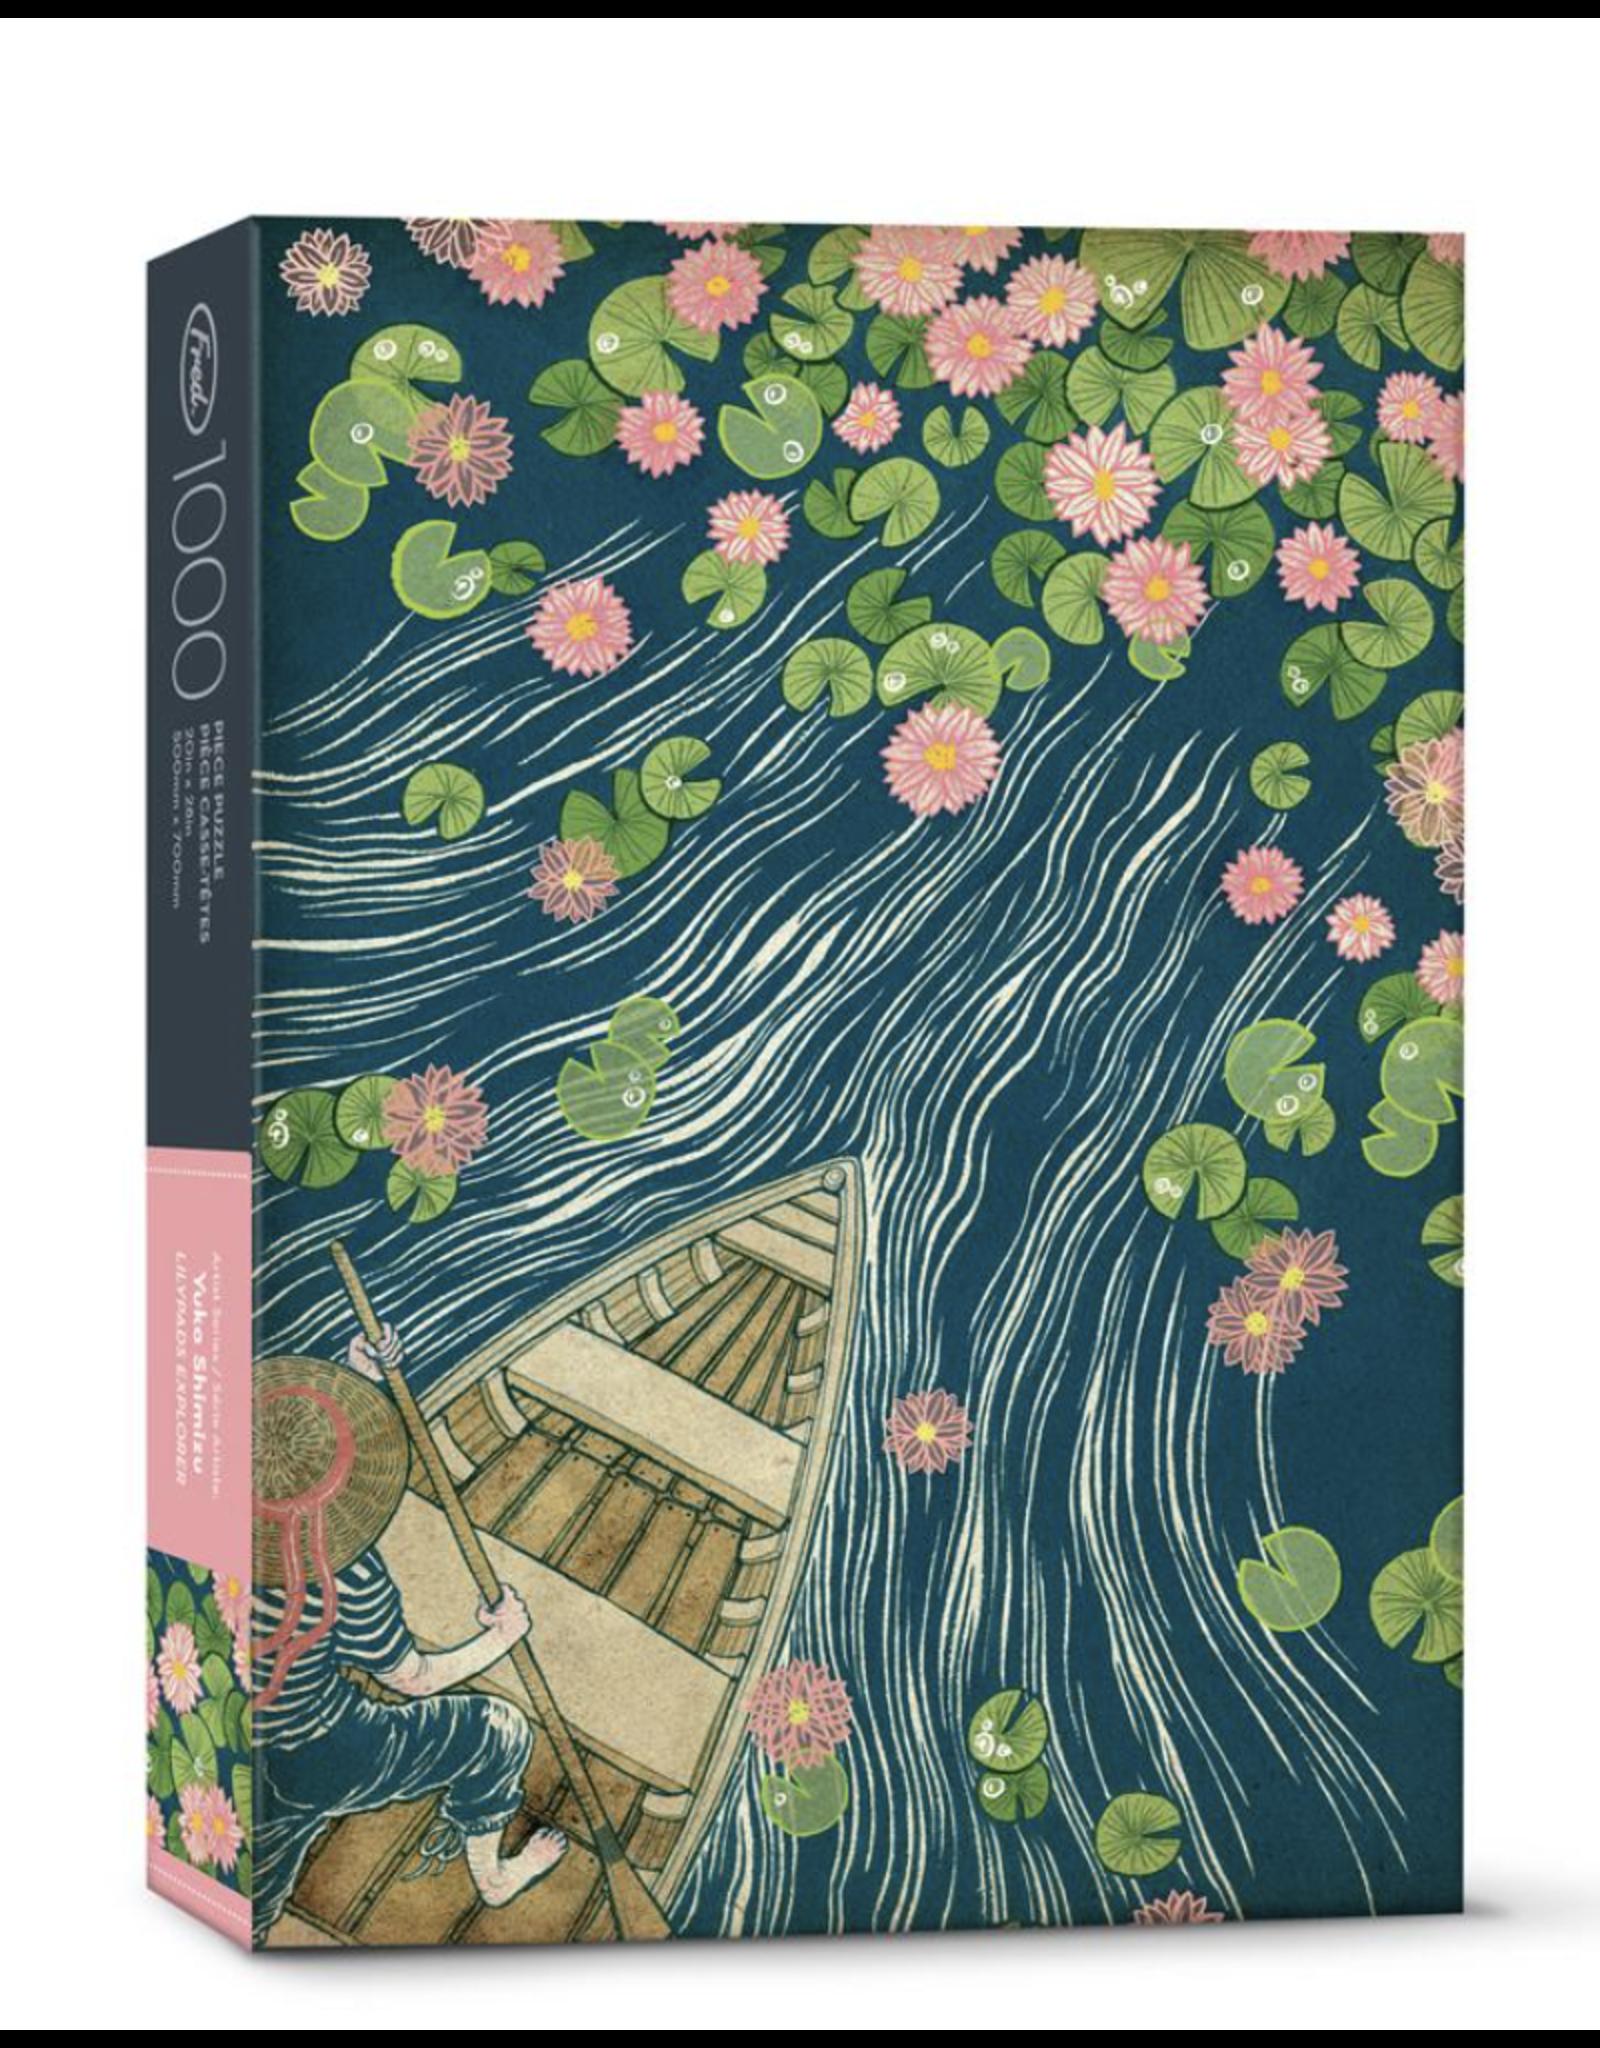 Shimizu Lilypads Puzzle - 1000 Pcs